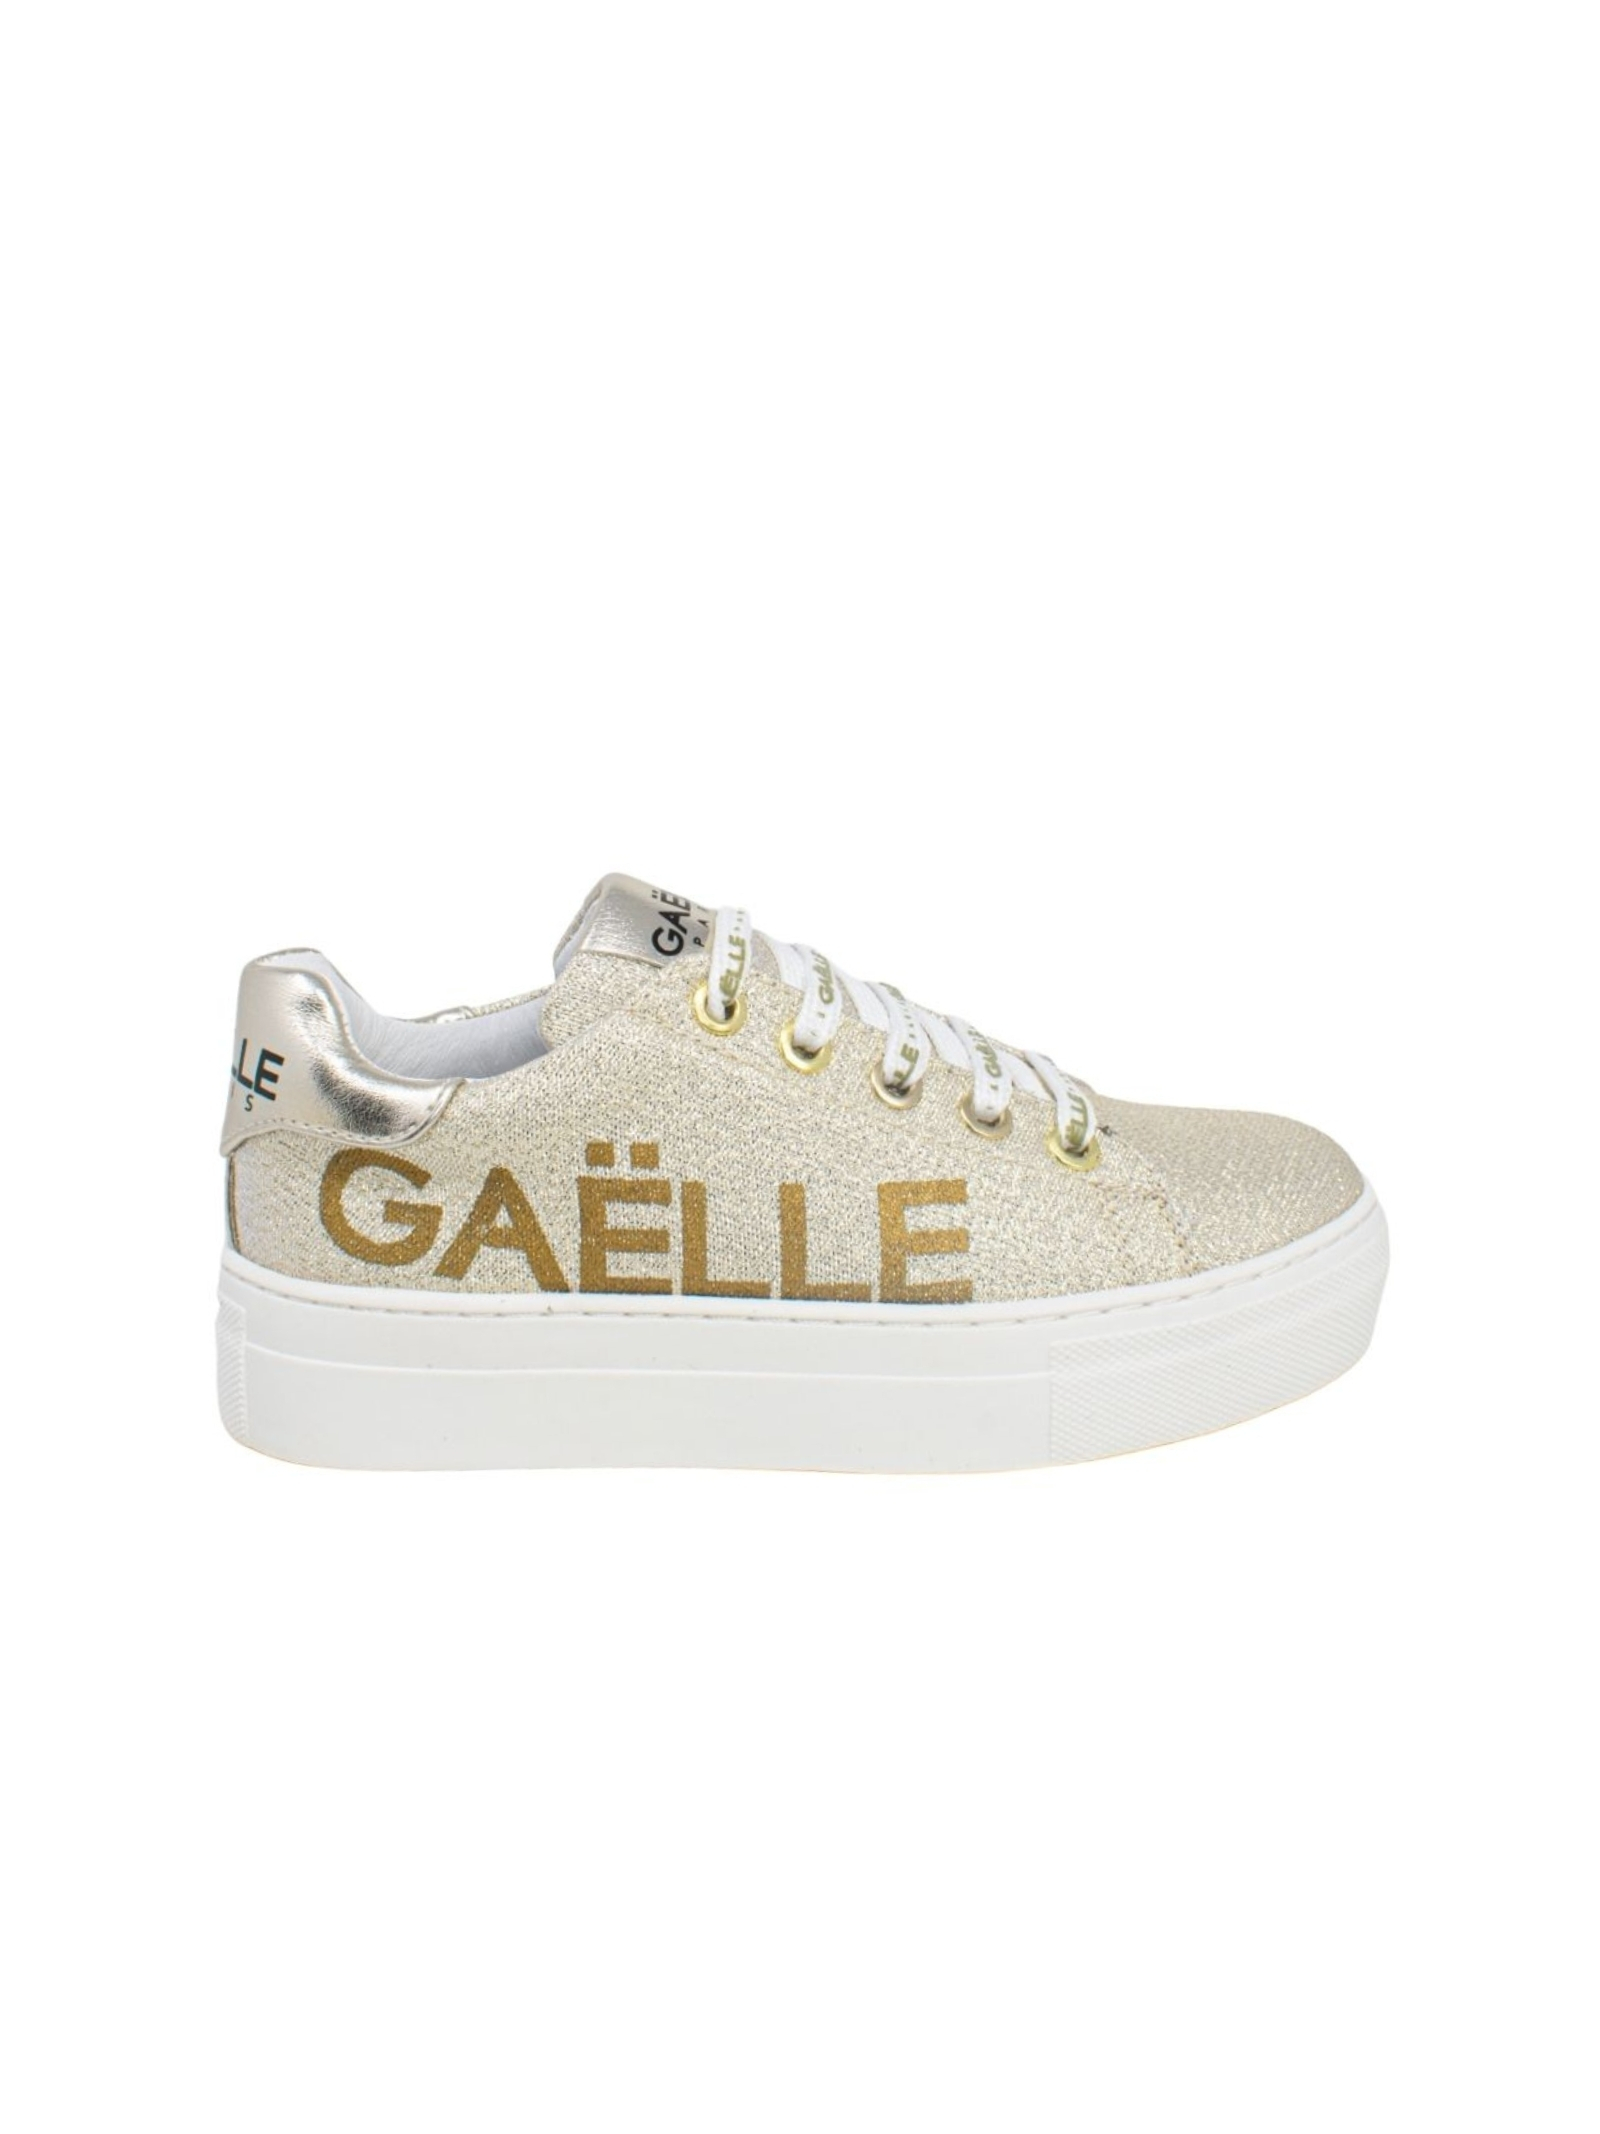 Sneakers Bambina Platinum GAËLLE PARIS KIDS | Sneakers | G600PLATINO